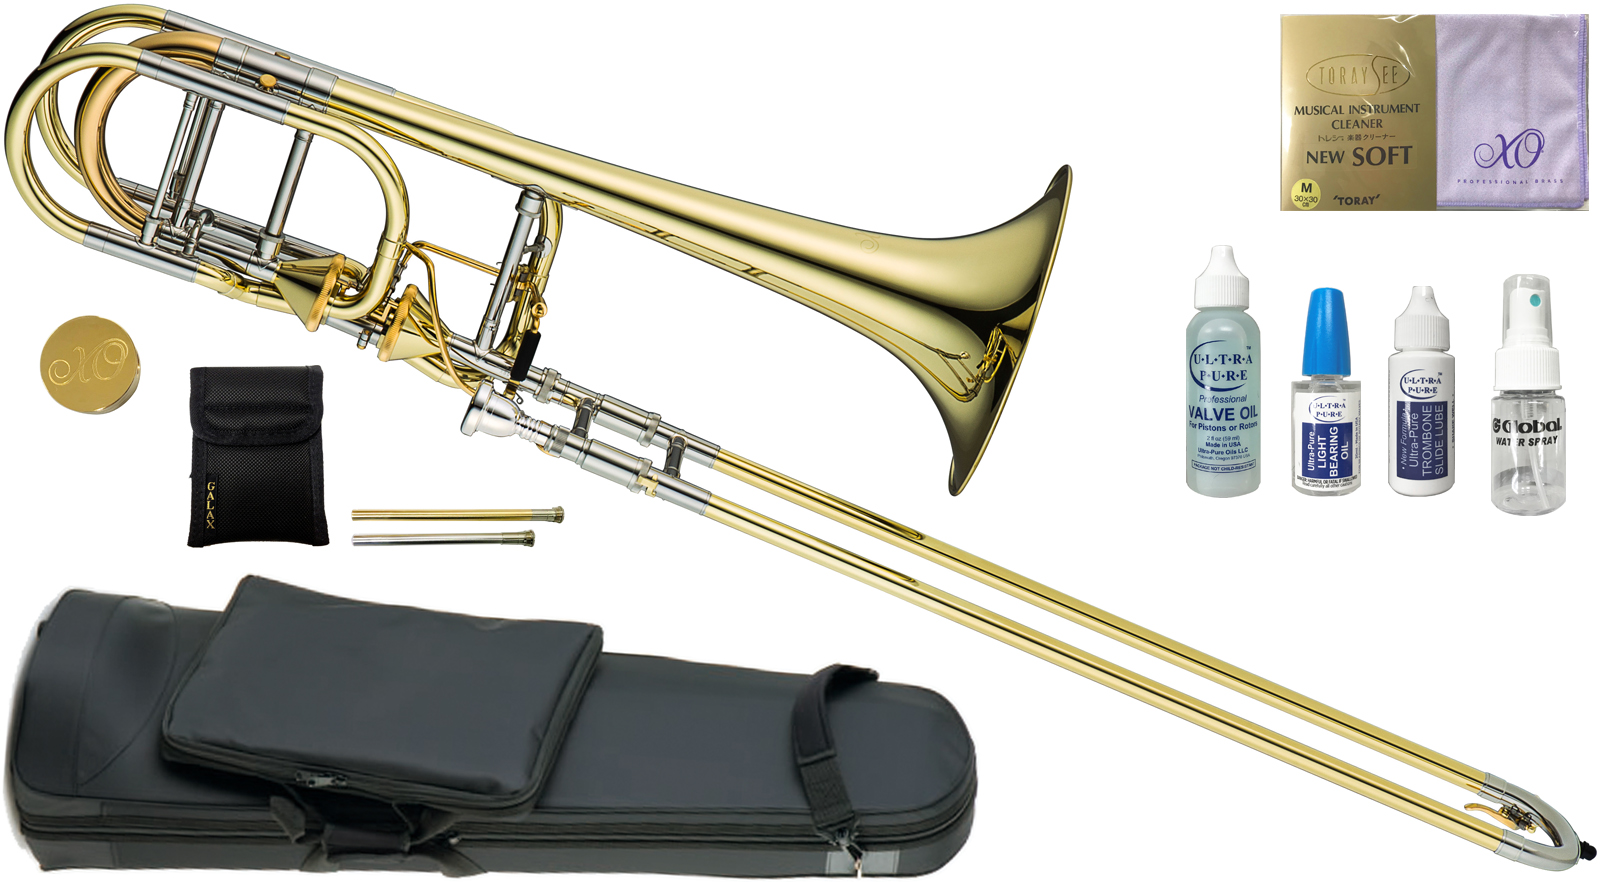 XO ( エックスオー ) 1240L-T トロンボーン 新品 B♭/F/G♭/D管 バストロンボーン アキシャルフローバルブ イエローブラス 太管 Bass Trombones RB-L Axial Flow Valve 送料無料